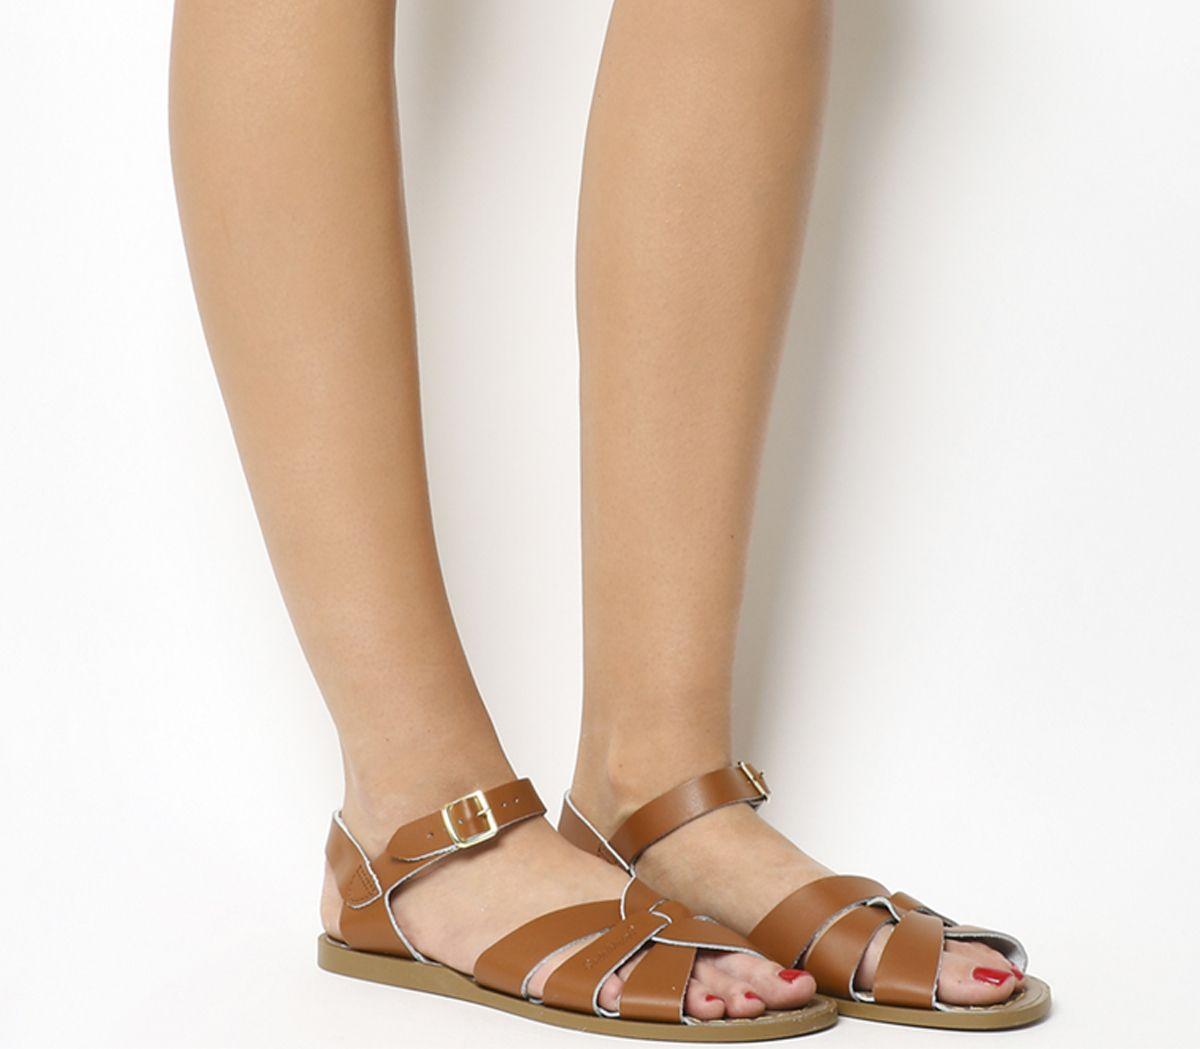 d9ba3a00b16 Salt Water Original Sandals Tan Leather - Sandals